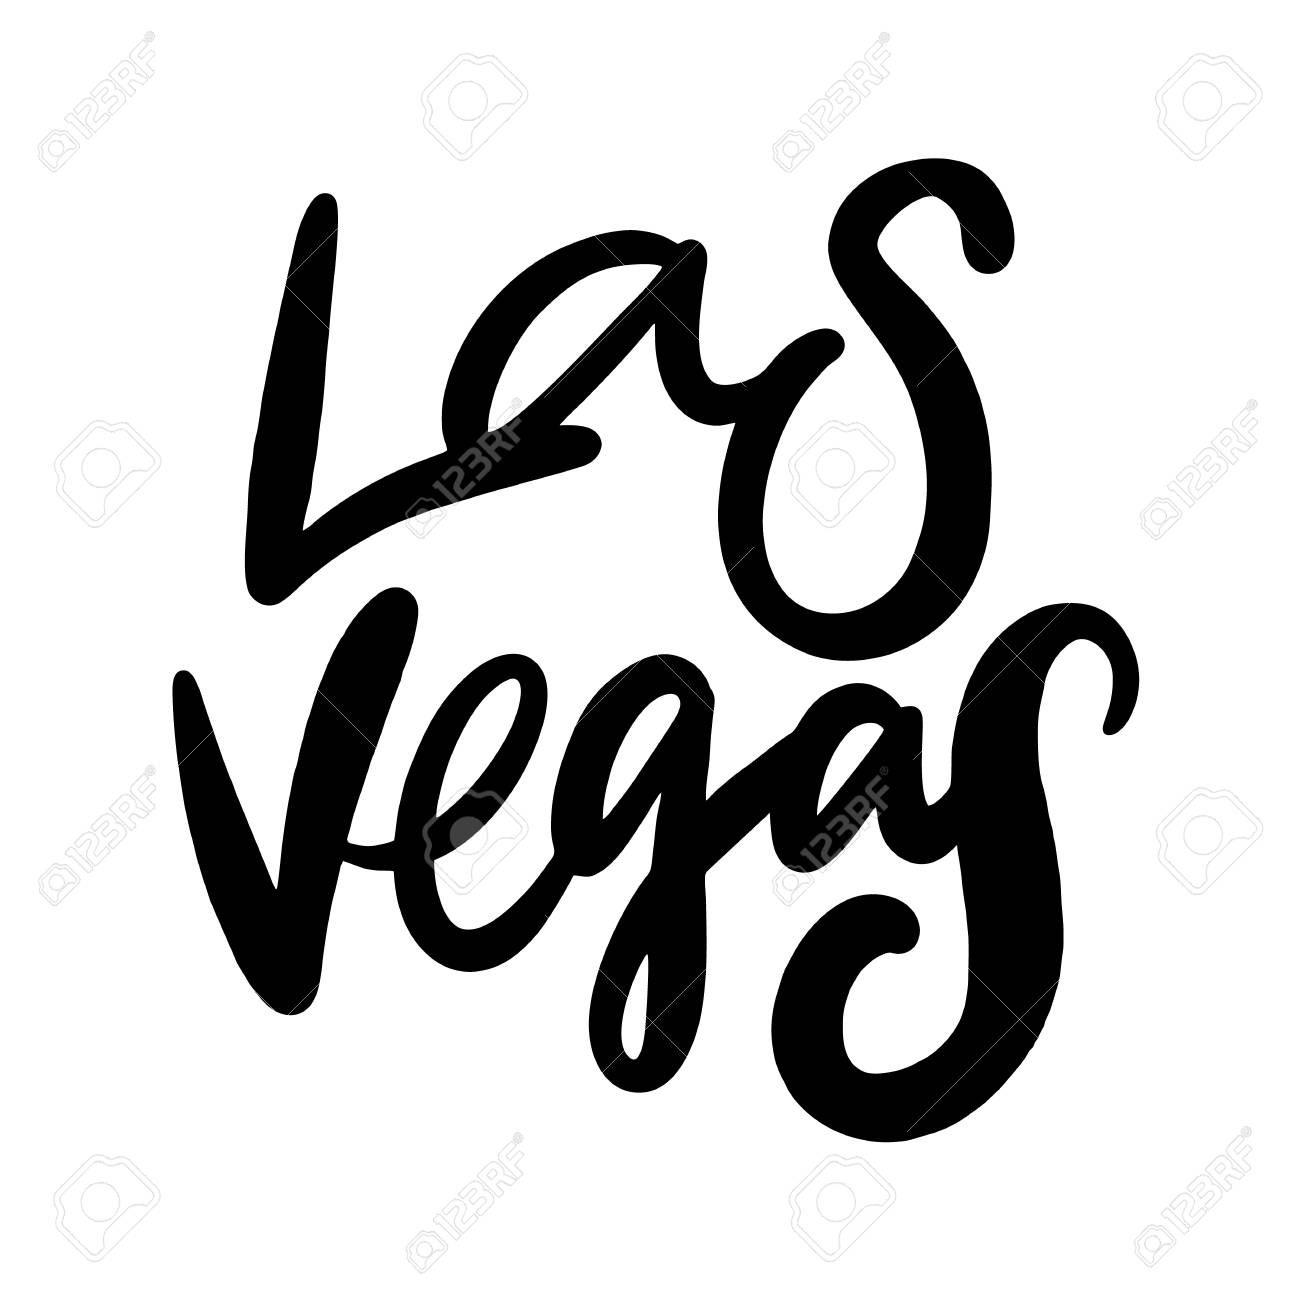 Las Vegas Sign Brush Vector Lettering Isolated On White Background